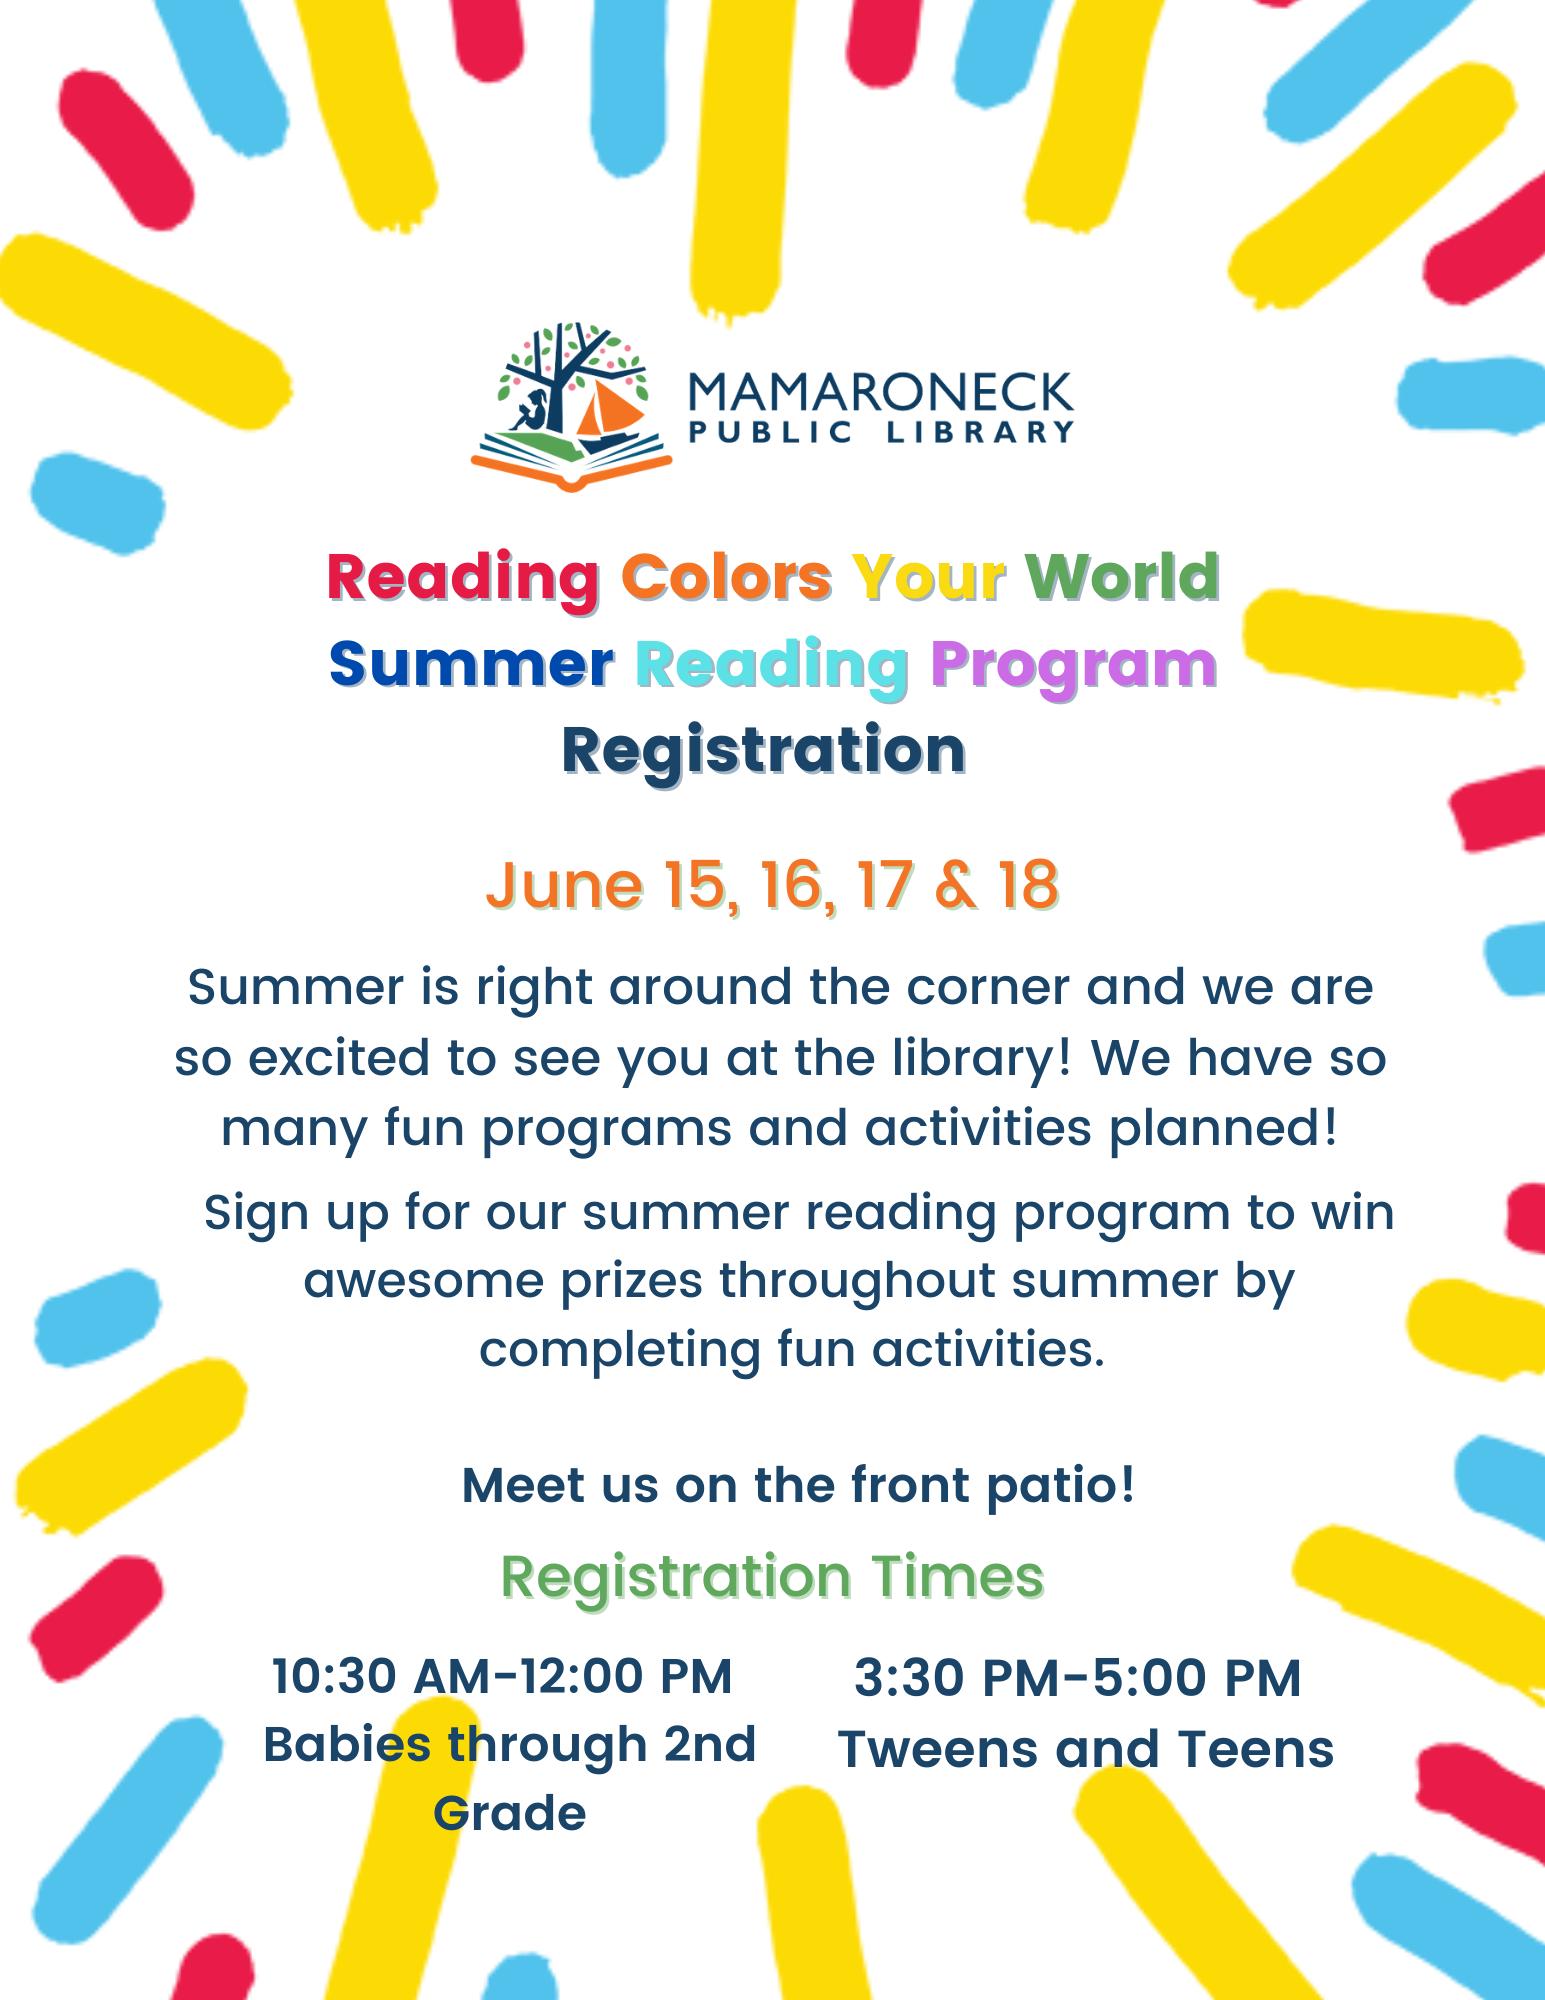 Summer Reading Registration for children and teens